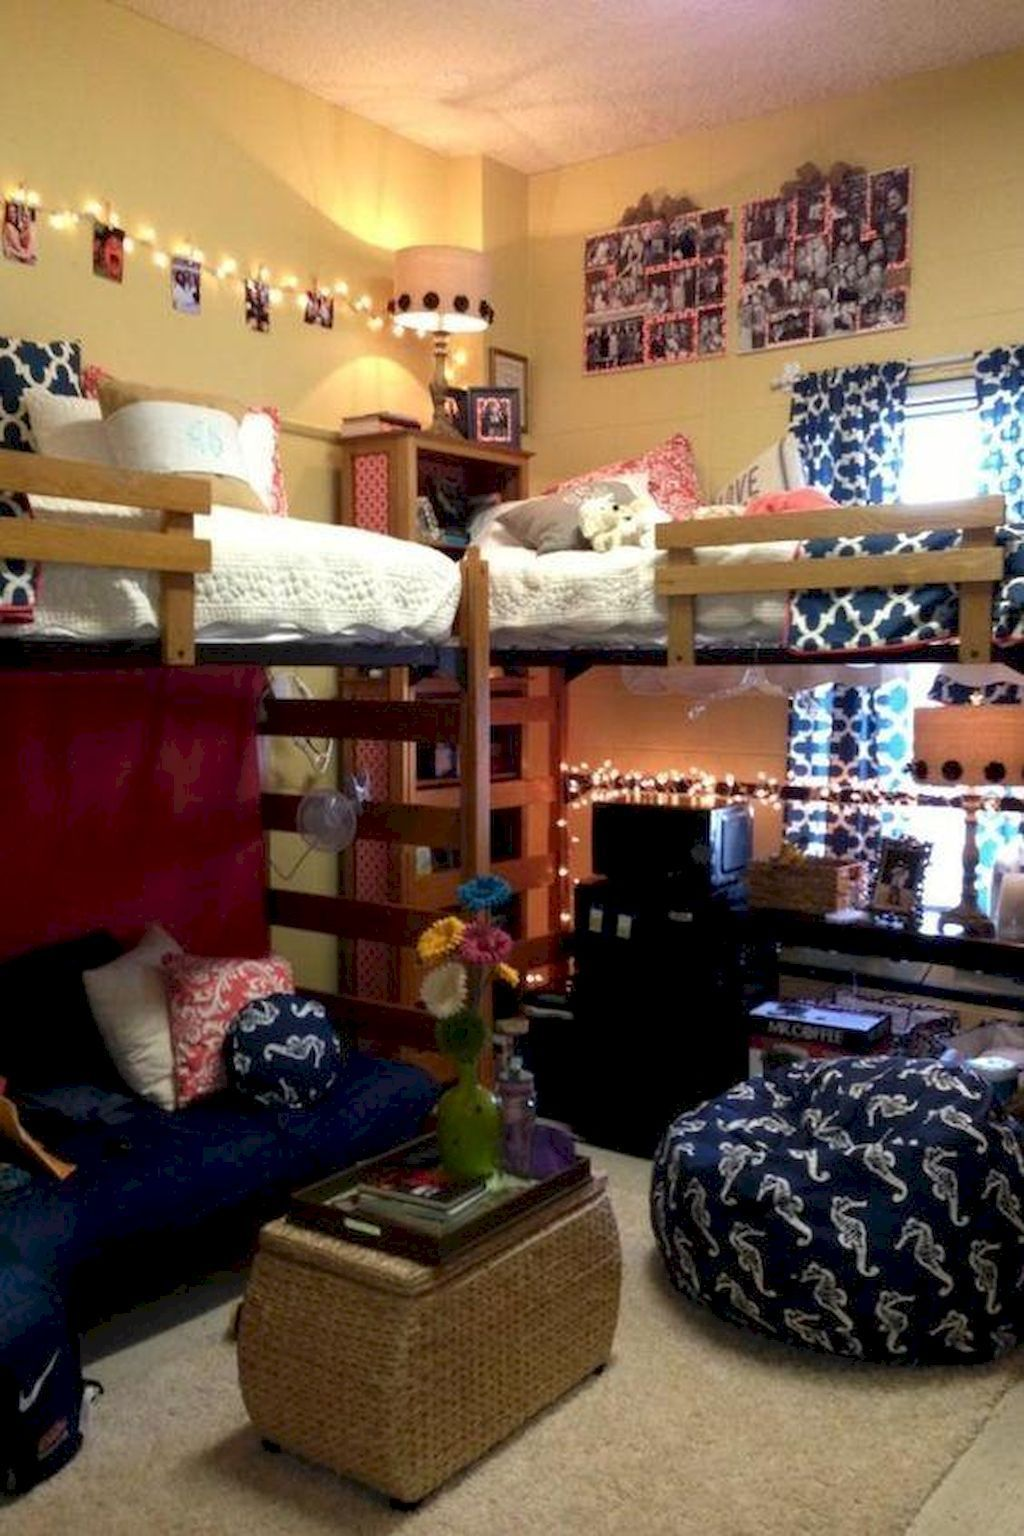 College dorm loft bed ideas   cute loft beds college dorm room design ideas for girl